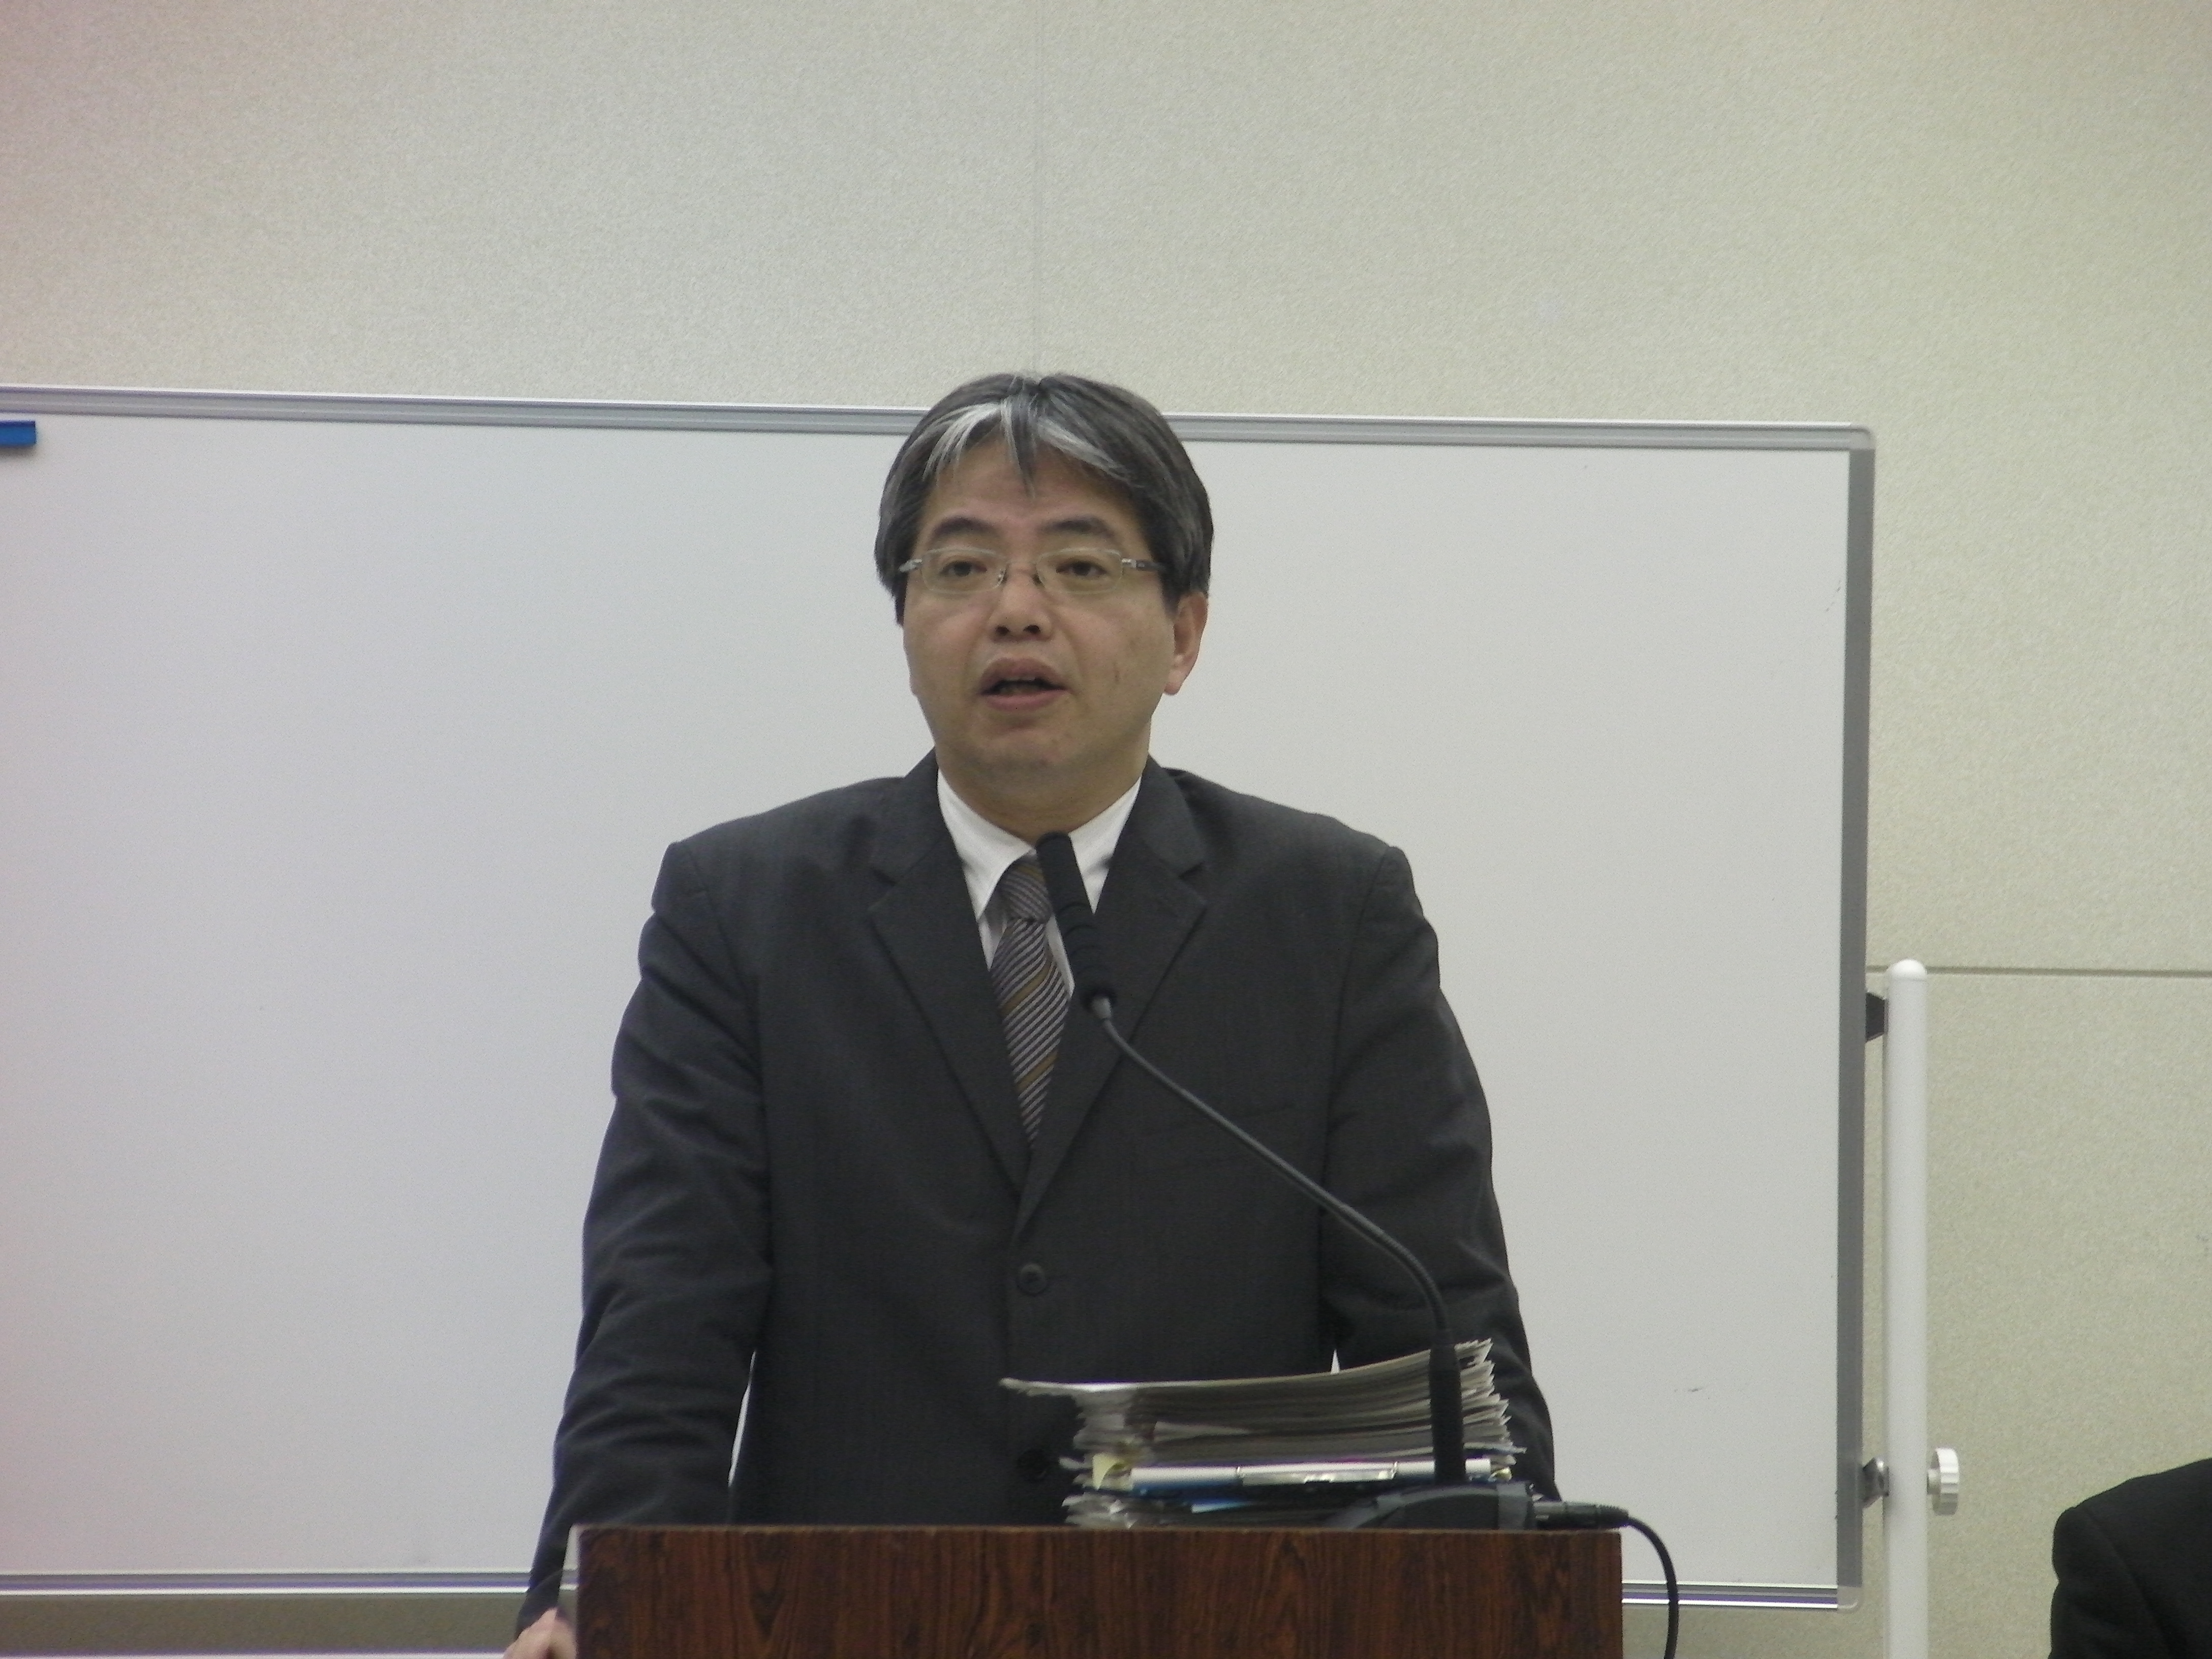 http://daily.magazine9.jp/m9/oshidori/SANY0120.JPG